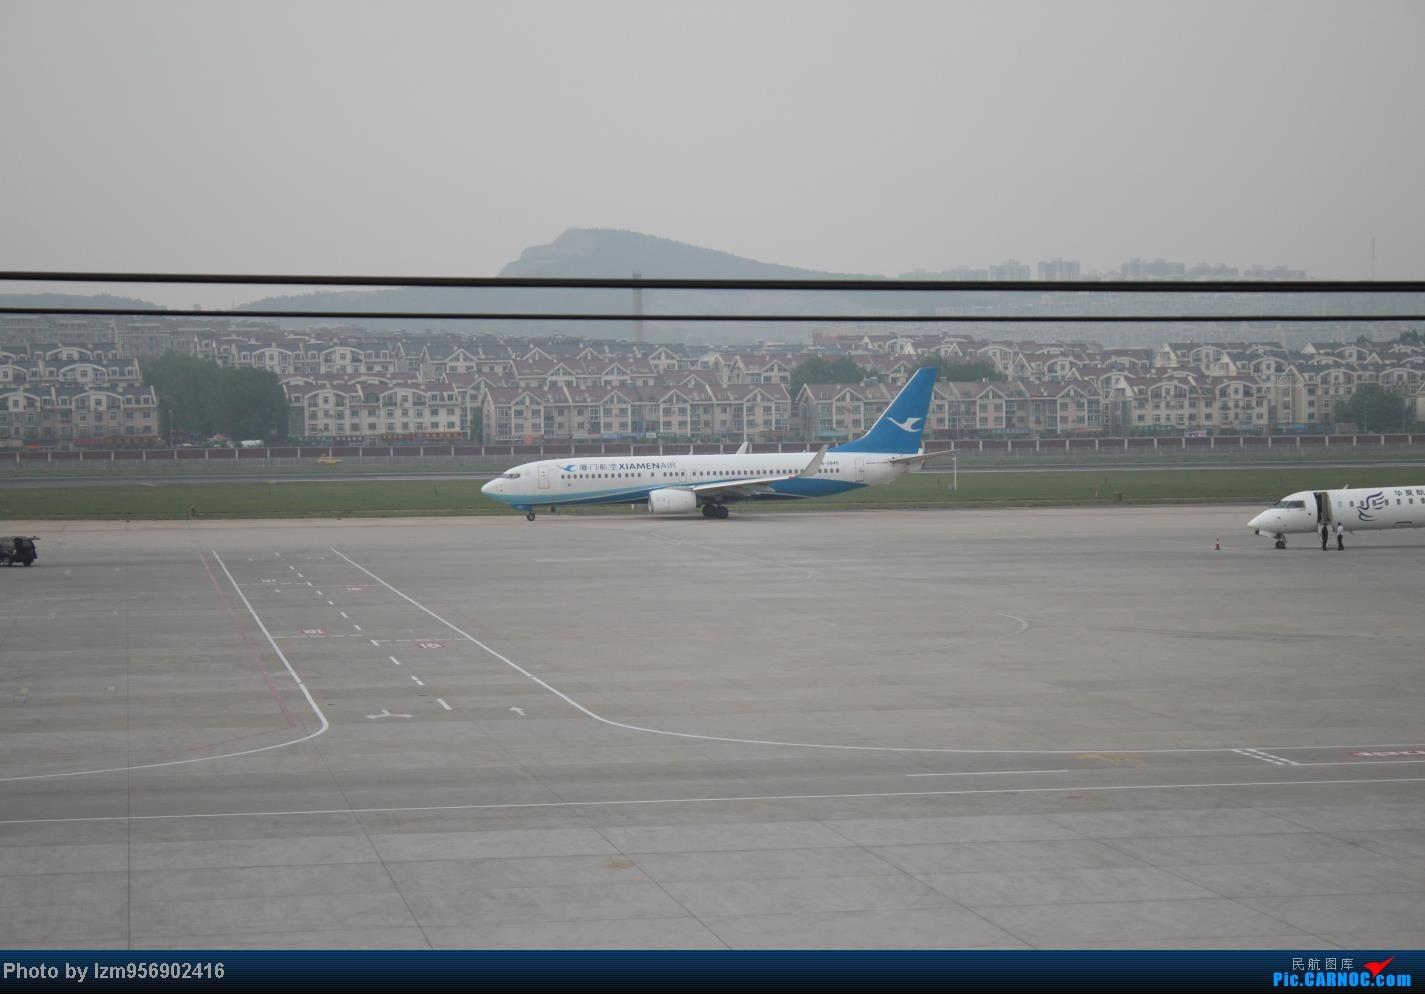 Re:[原创]DLC蹲点大半天,拍到了大棒航空772=w= BOEING 737-800 B-5845 中国大连周水子机场